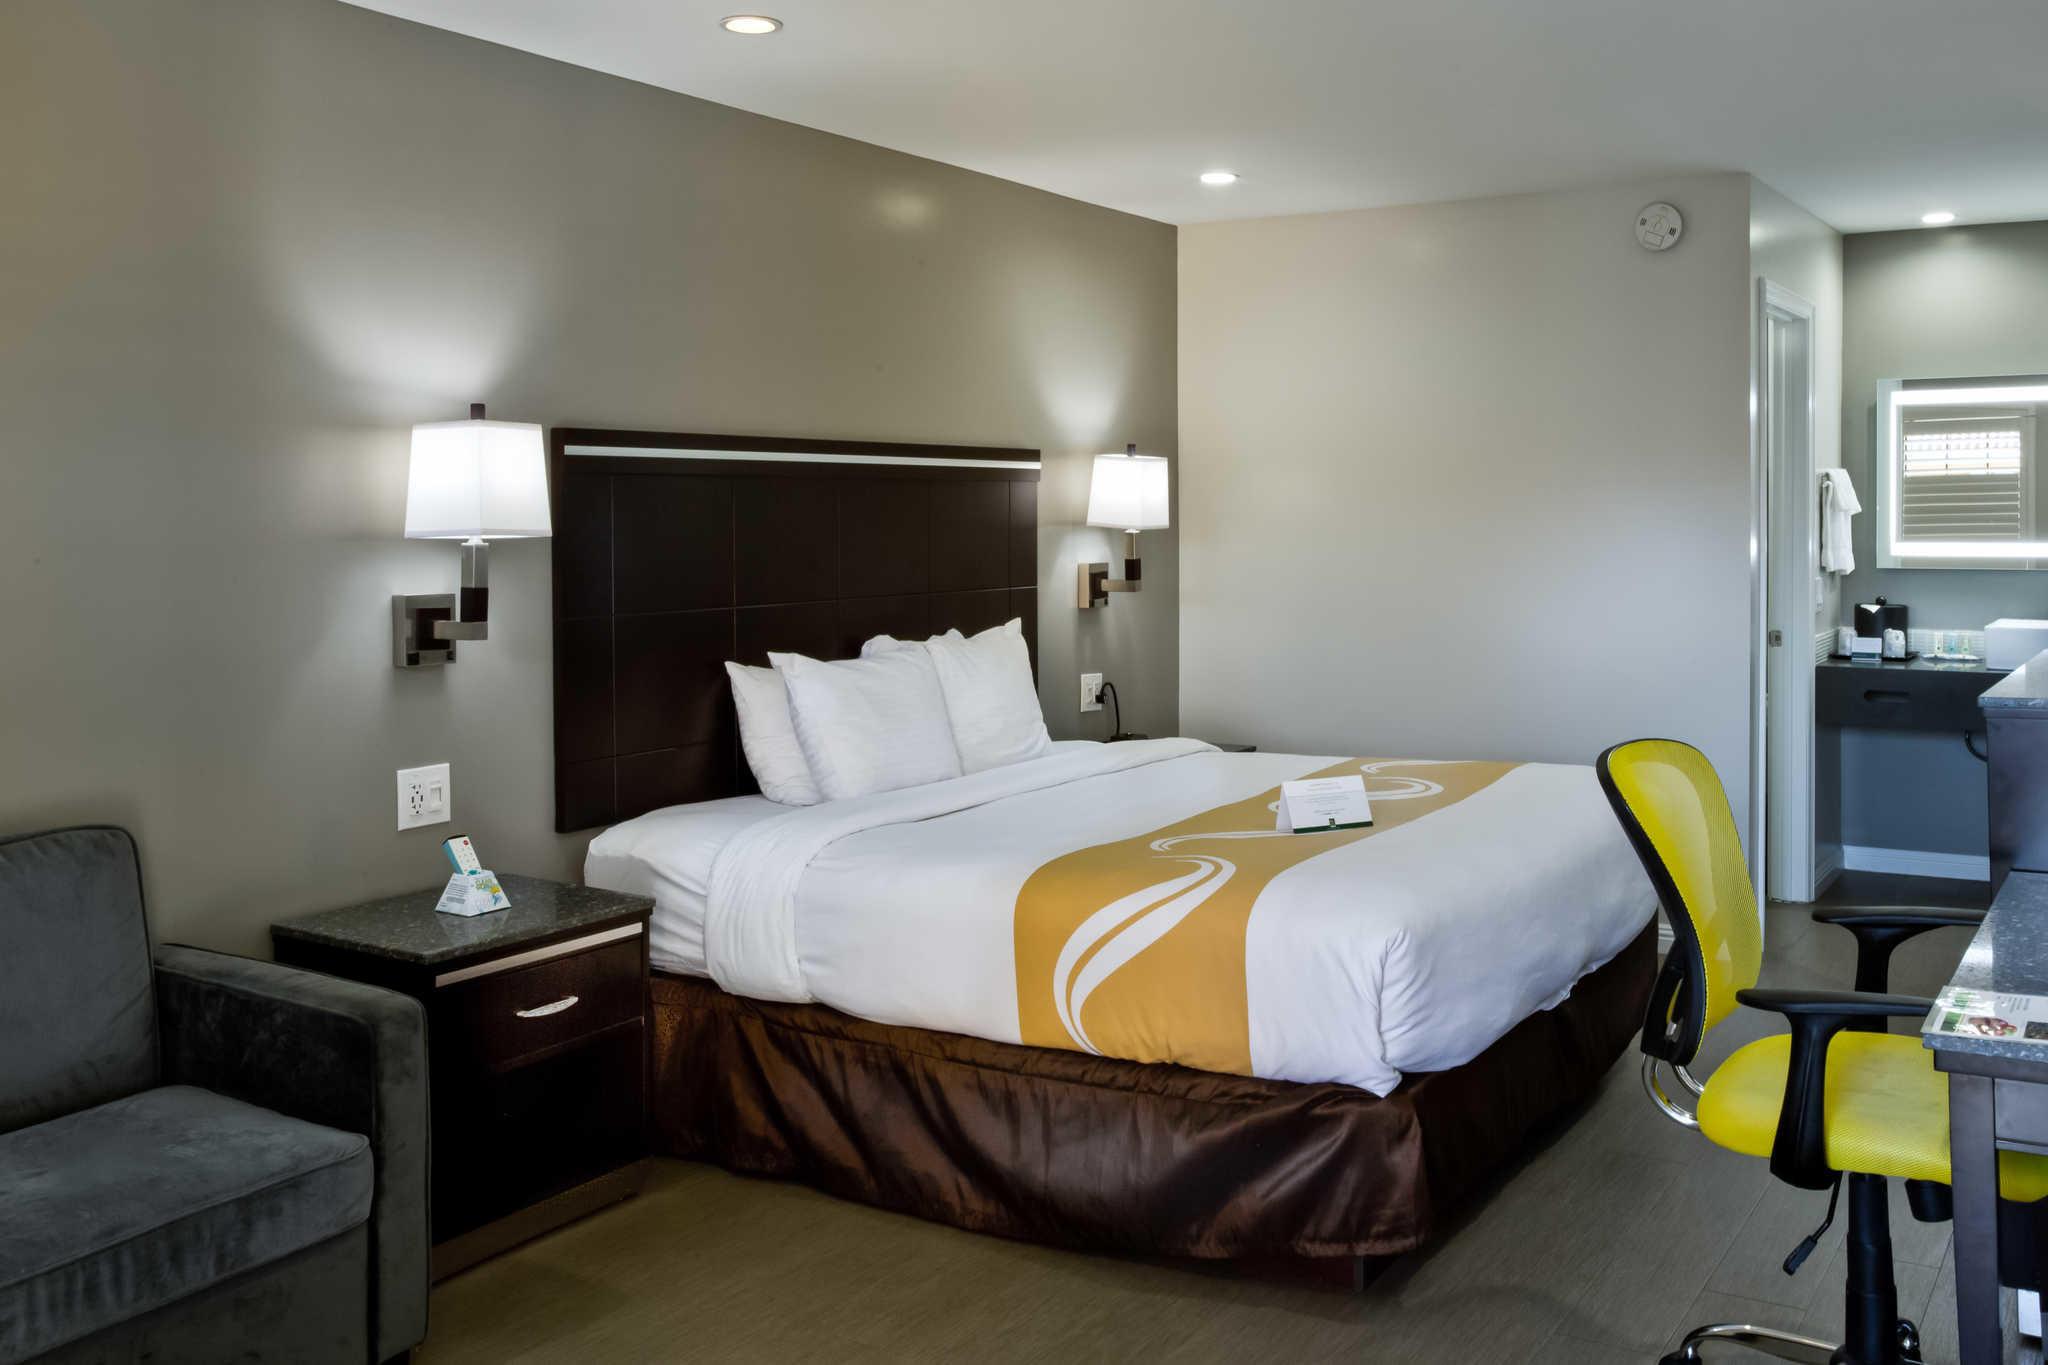 Quality Inn image 16